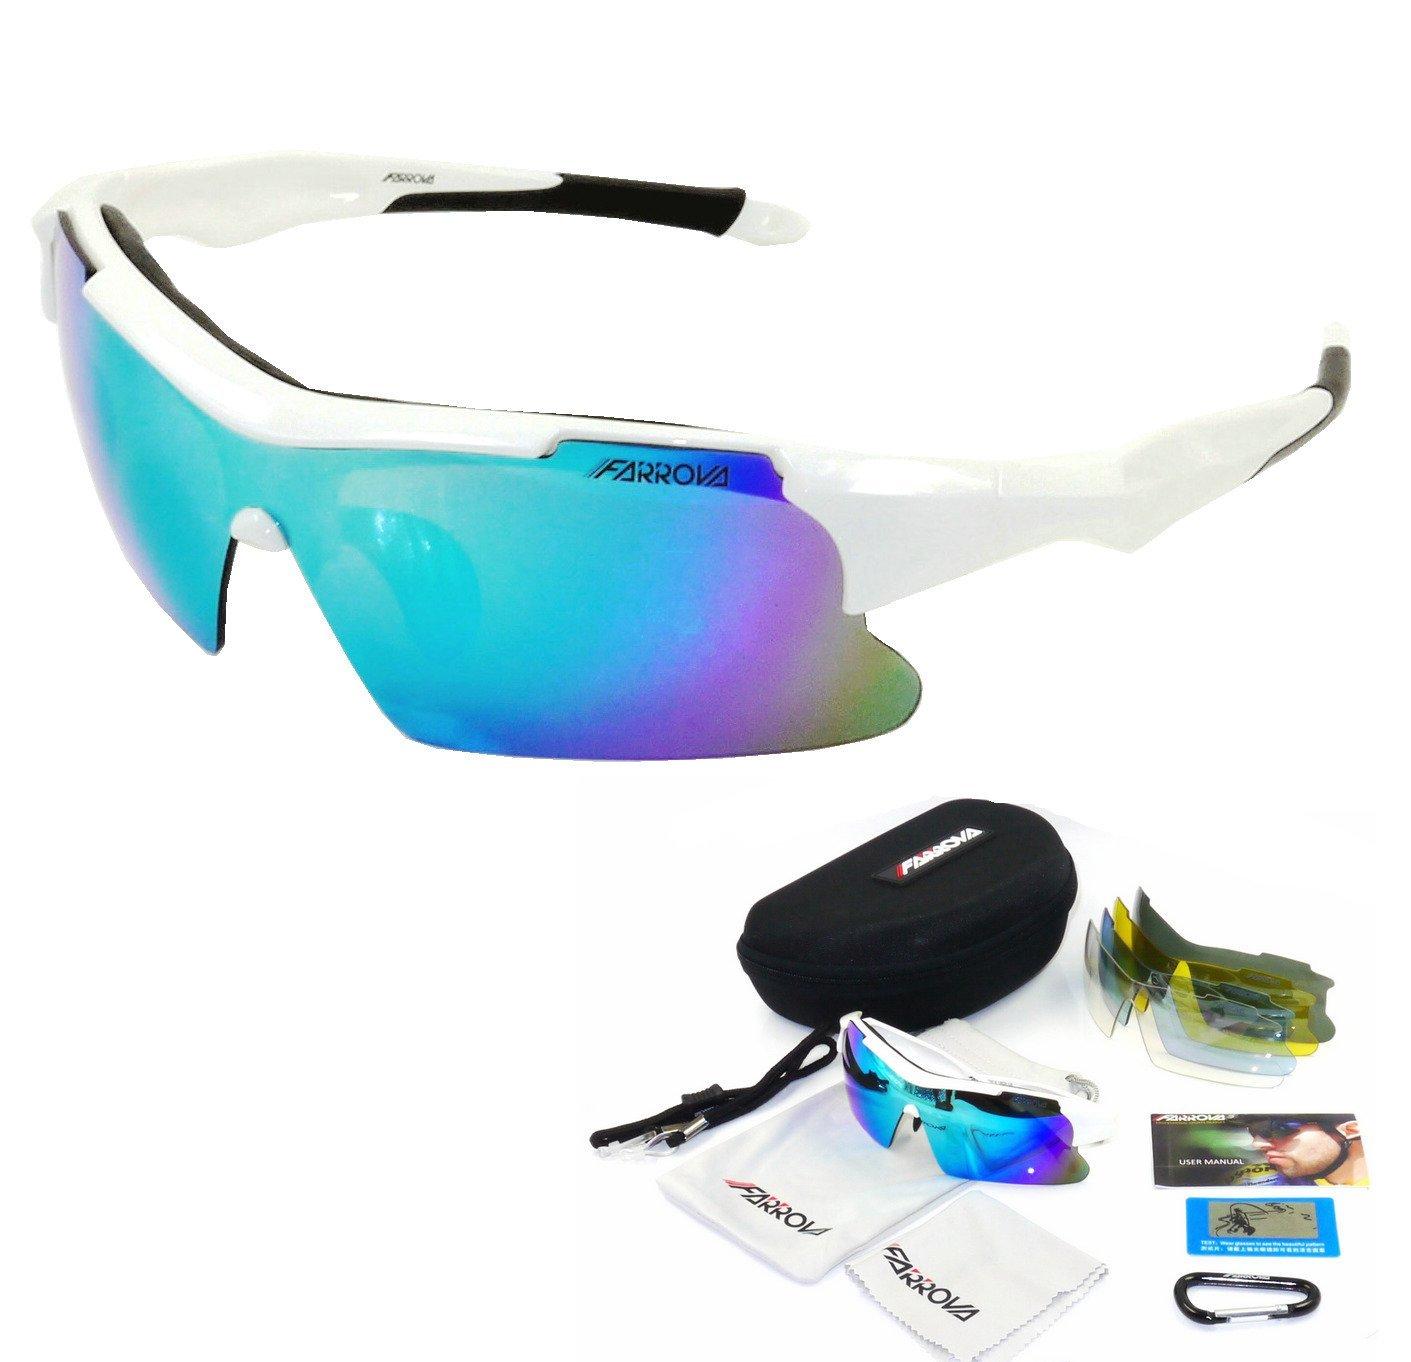 acb7799719d Get Quotations · FARROVA - KD018P POLARIZED Sports Sunglasses with 5 Set  Interchangeable Lenses (Main Black Grey Lenses